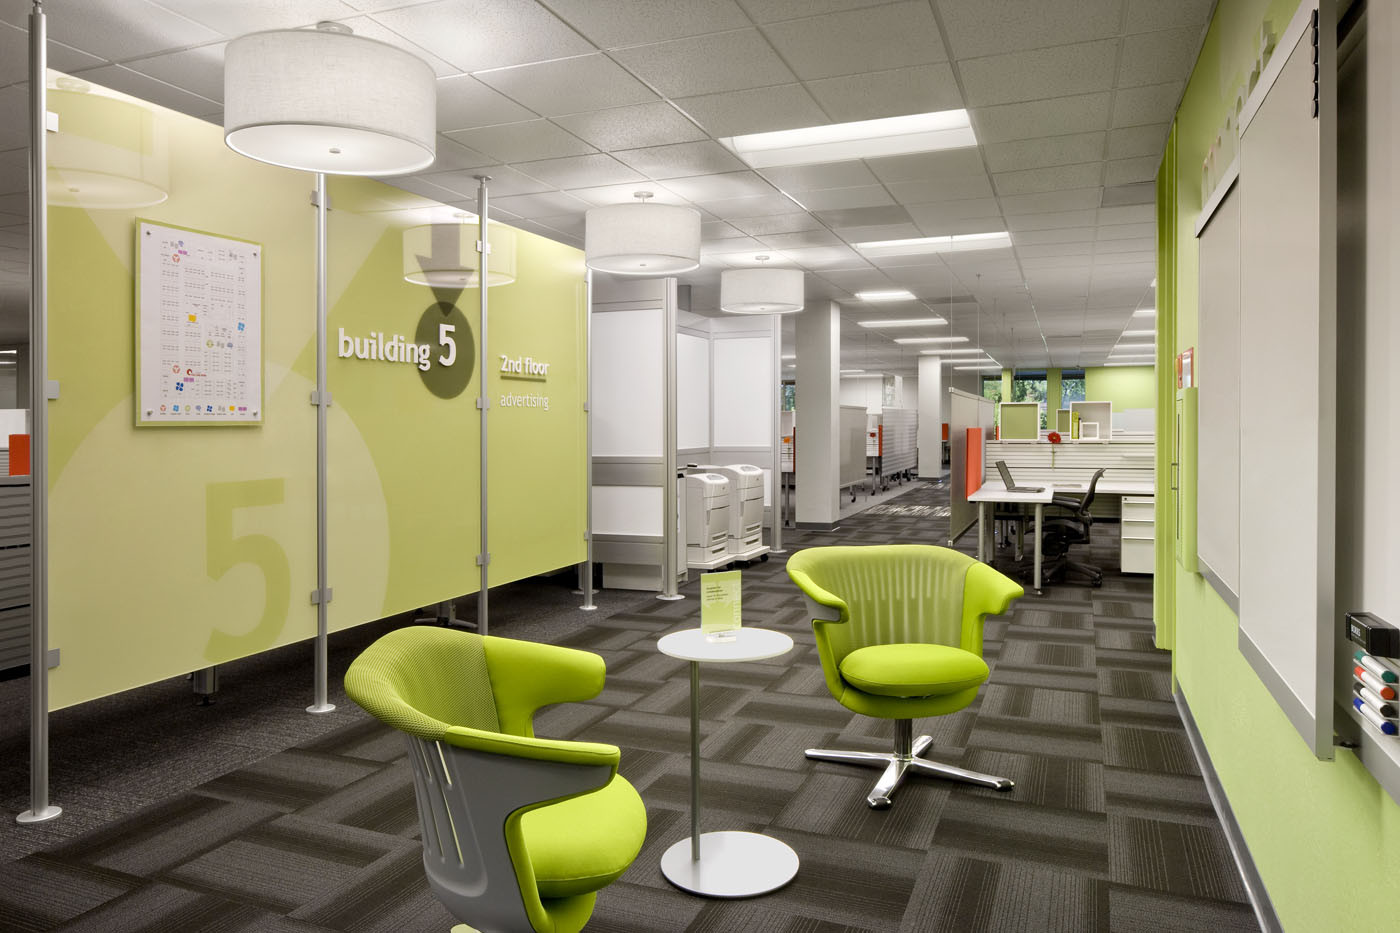 Ebay workplace initiative valerio dewalt train for Sustainable hotel design